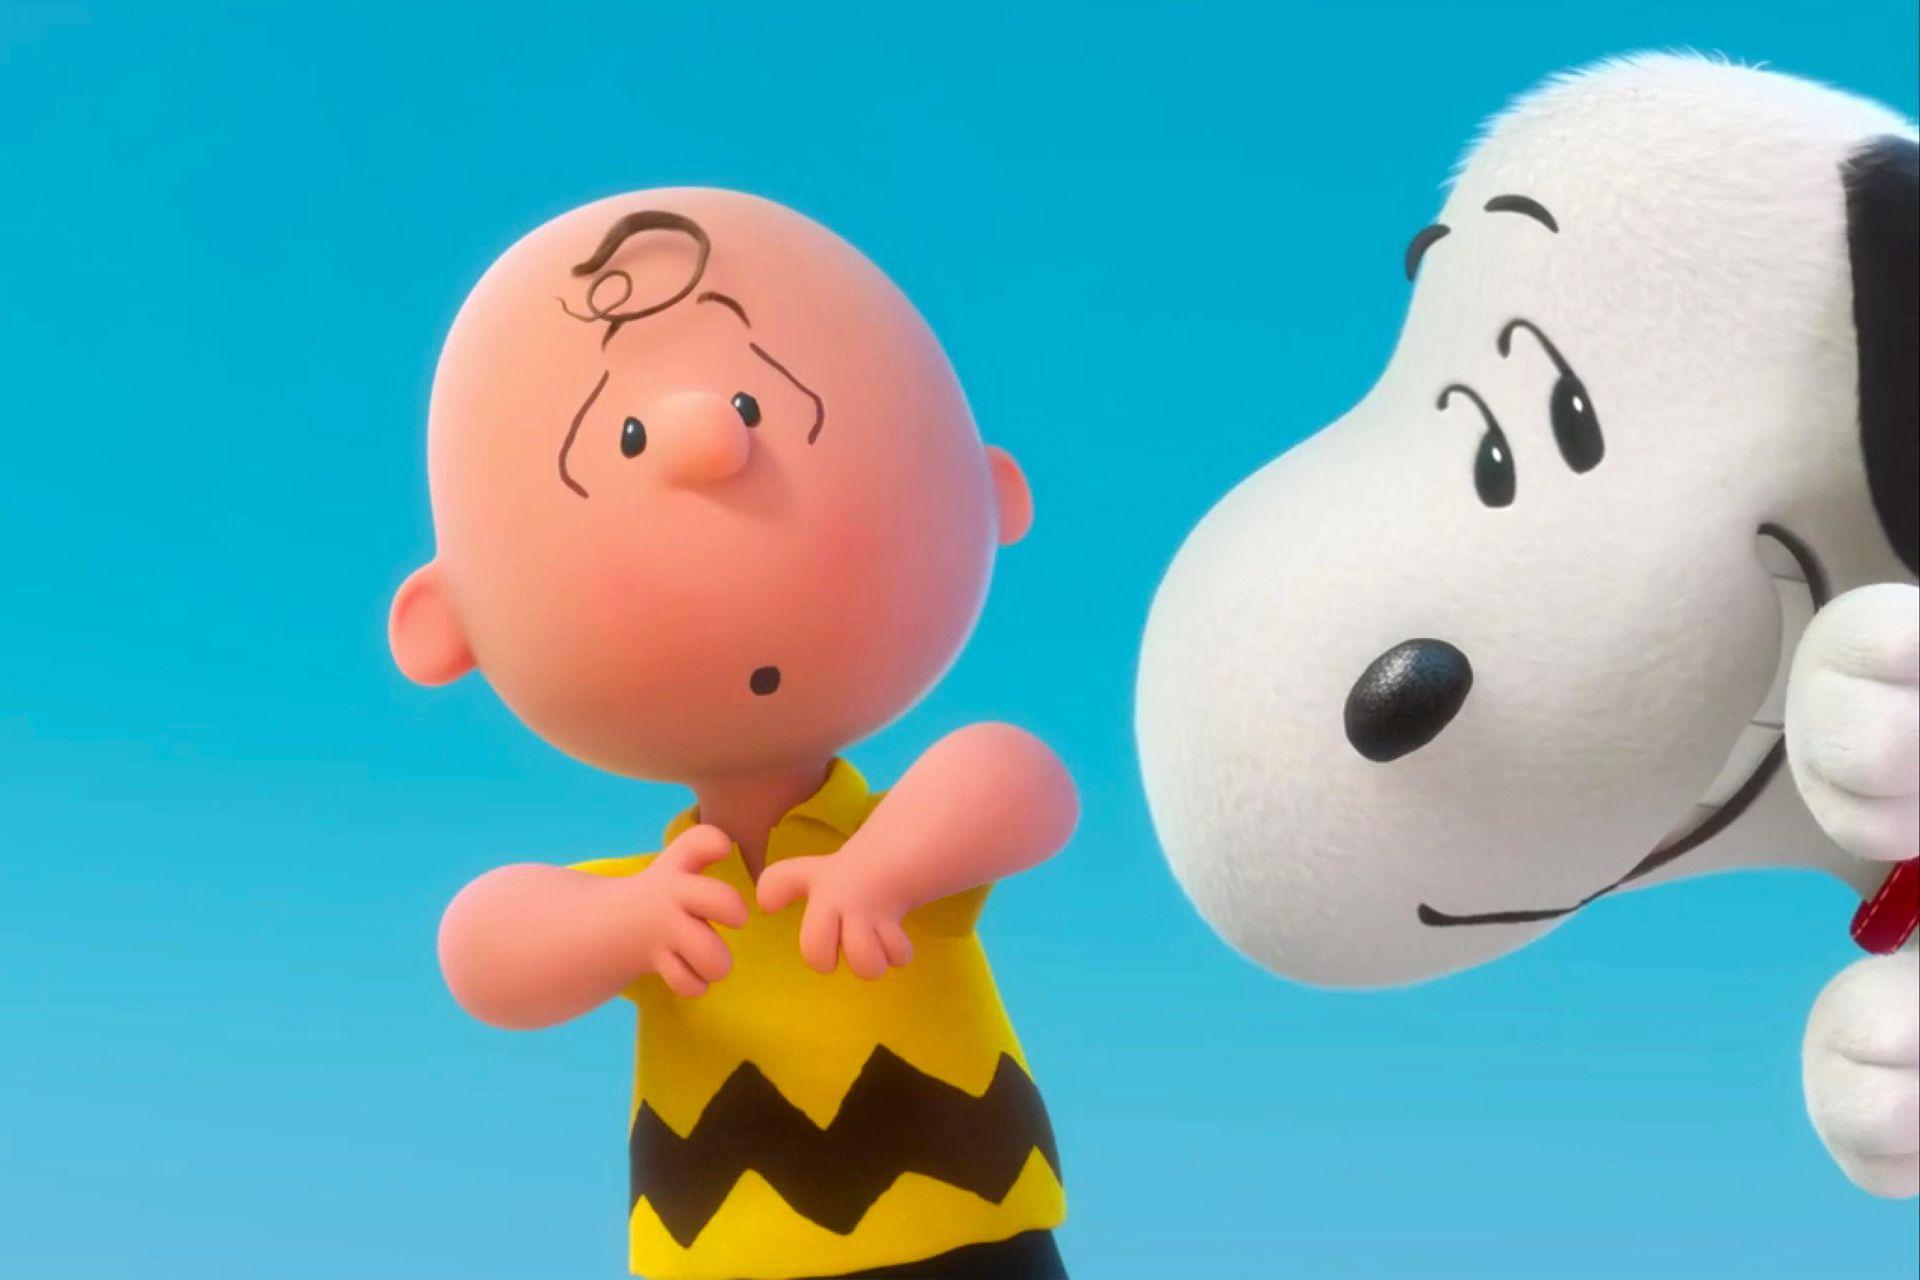 Woodstock quot peanuts quot desktop wallpaper - A Charlie Brown Christmas Wallpaper Cartoon Wallpapers